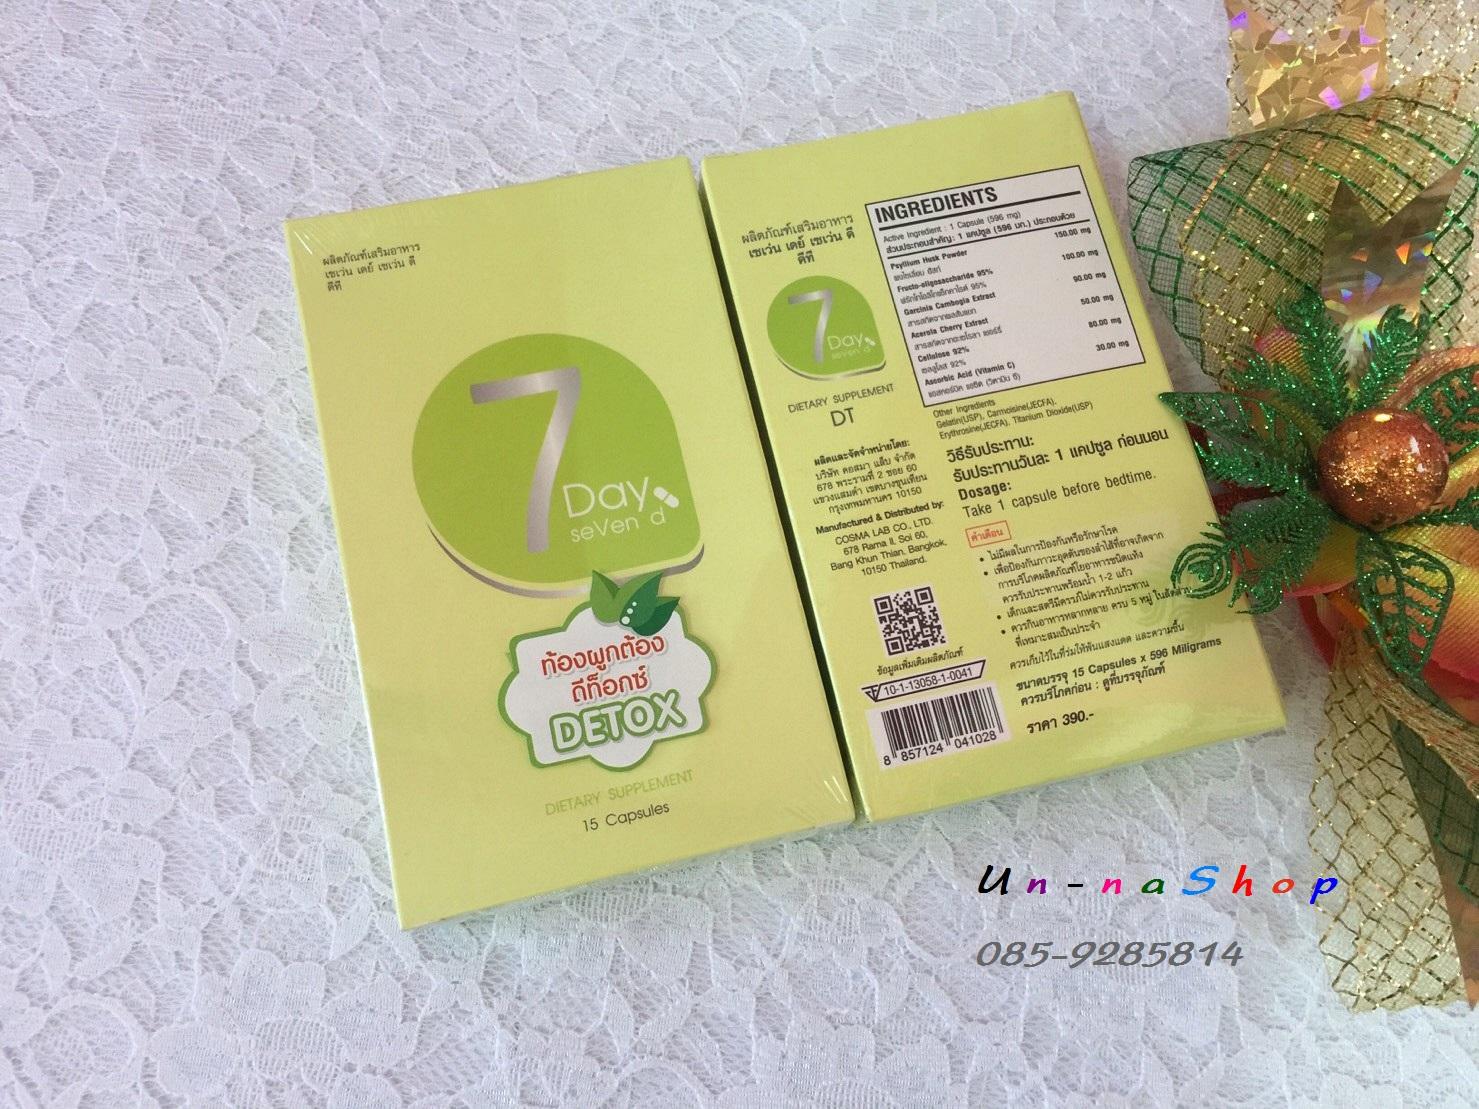 7 Day Seven D Detox เซเว่น เดย์ เซเว่น ดี ดีท็อกซ์ง่ายๆ 1 แคปซูลก่อนนอน ไม่ต้องชง